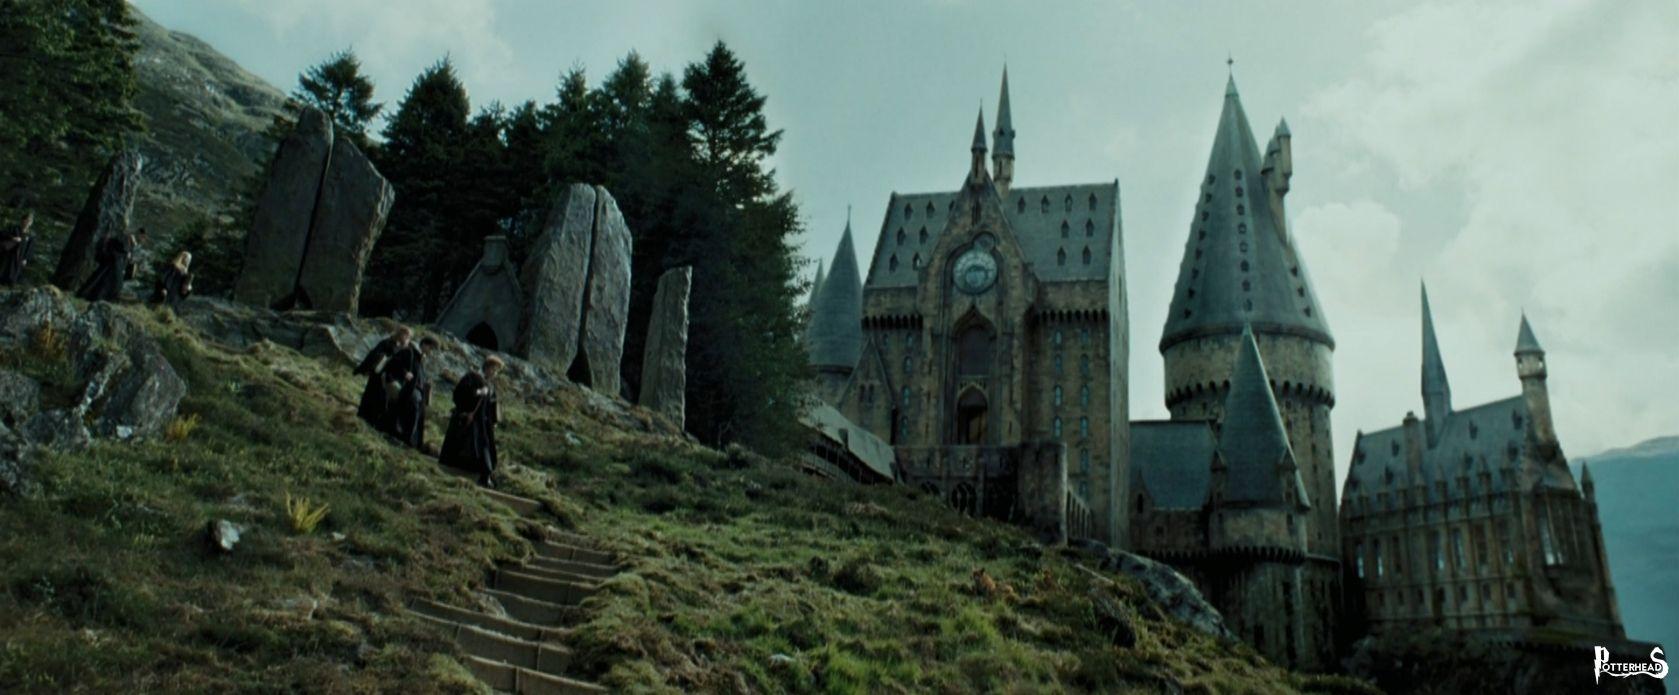 Cerchio di Pietre Harry Potter - PotterPedia.it